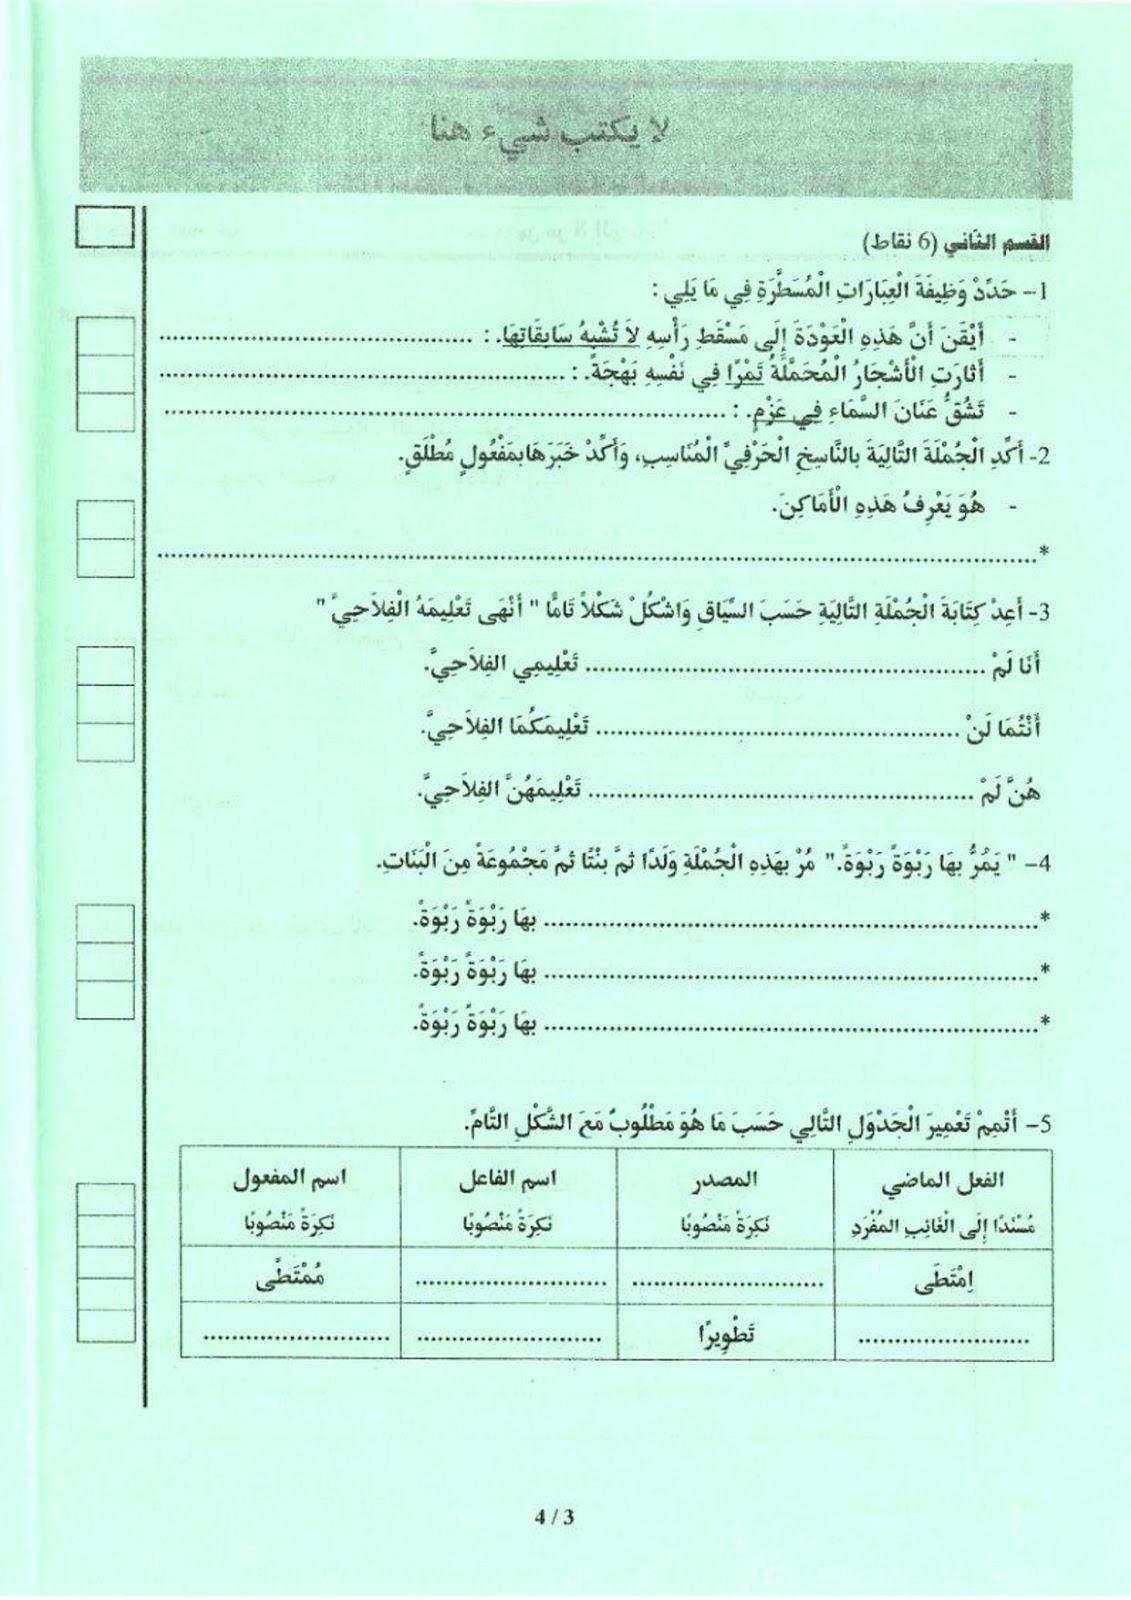 arabe page 003 - إختبارات اليوم الأول مع الإصلاح سيزيام 2018 عربية و انجليزية